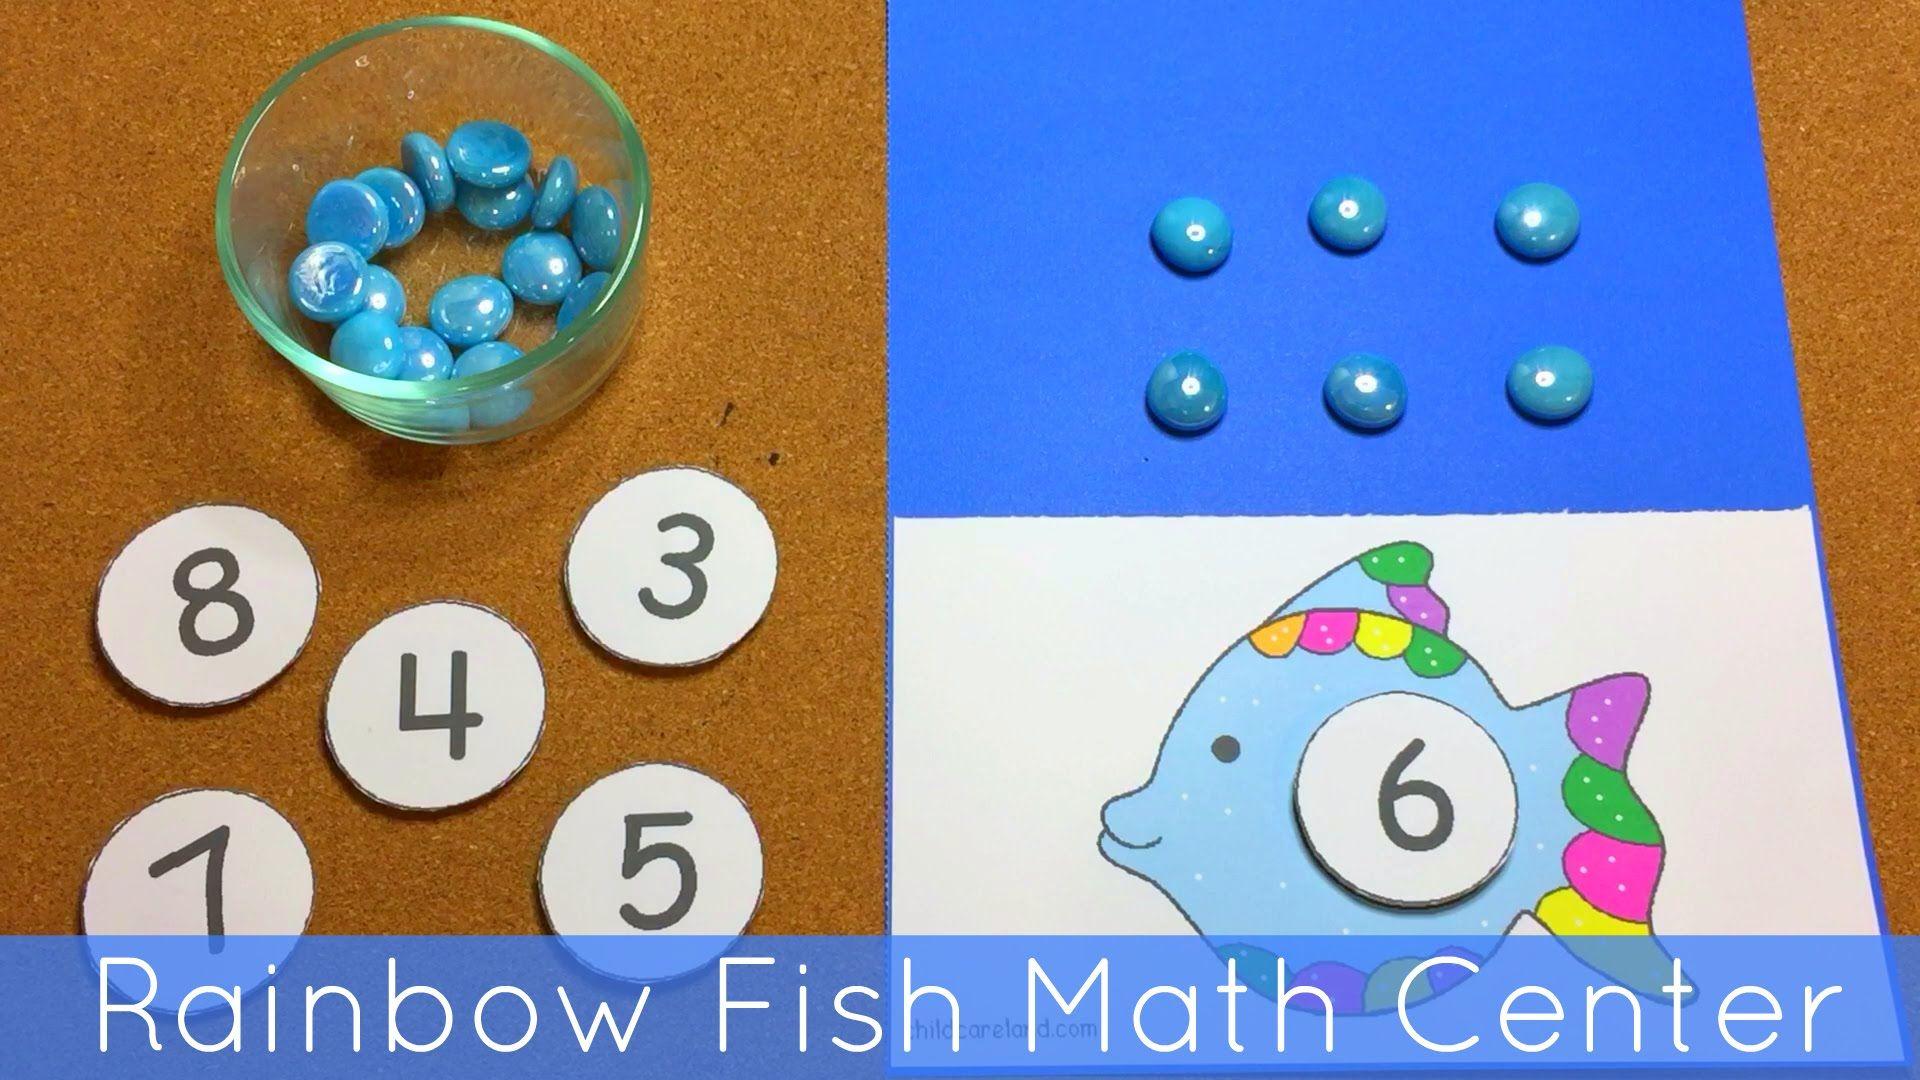 Rainbow Fish Math Center For Preschool And Kindergarten